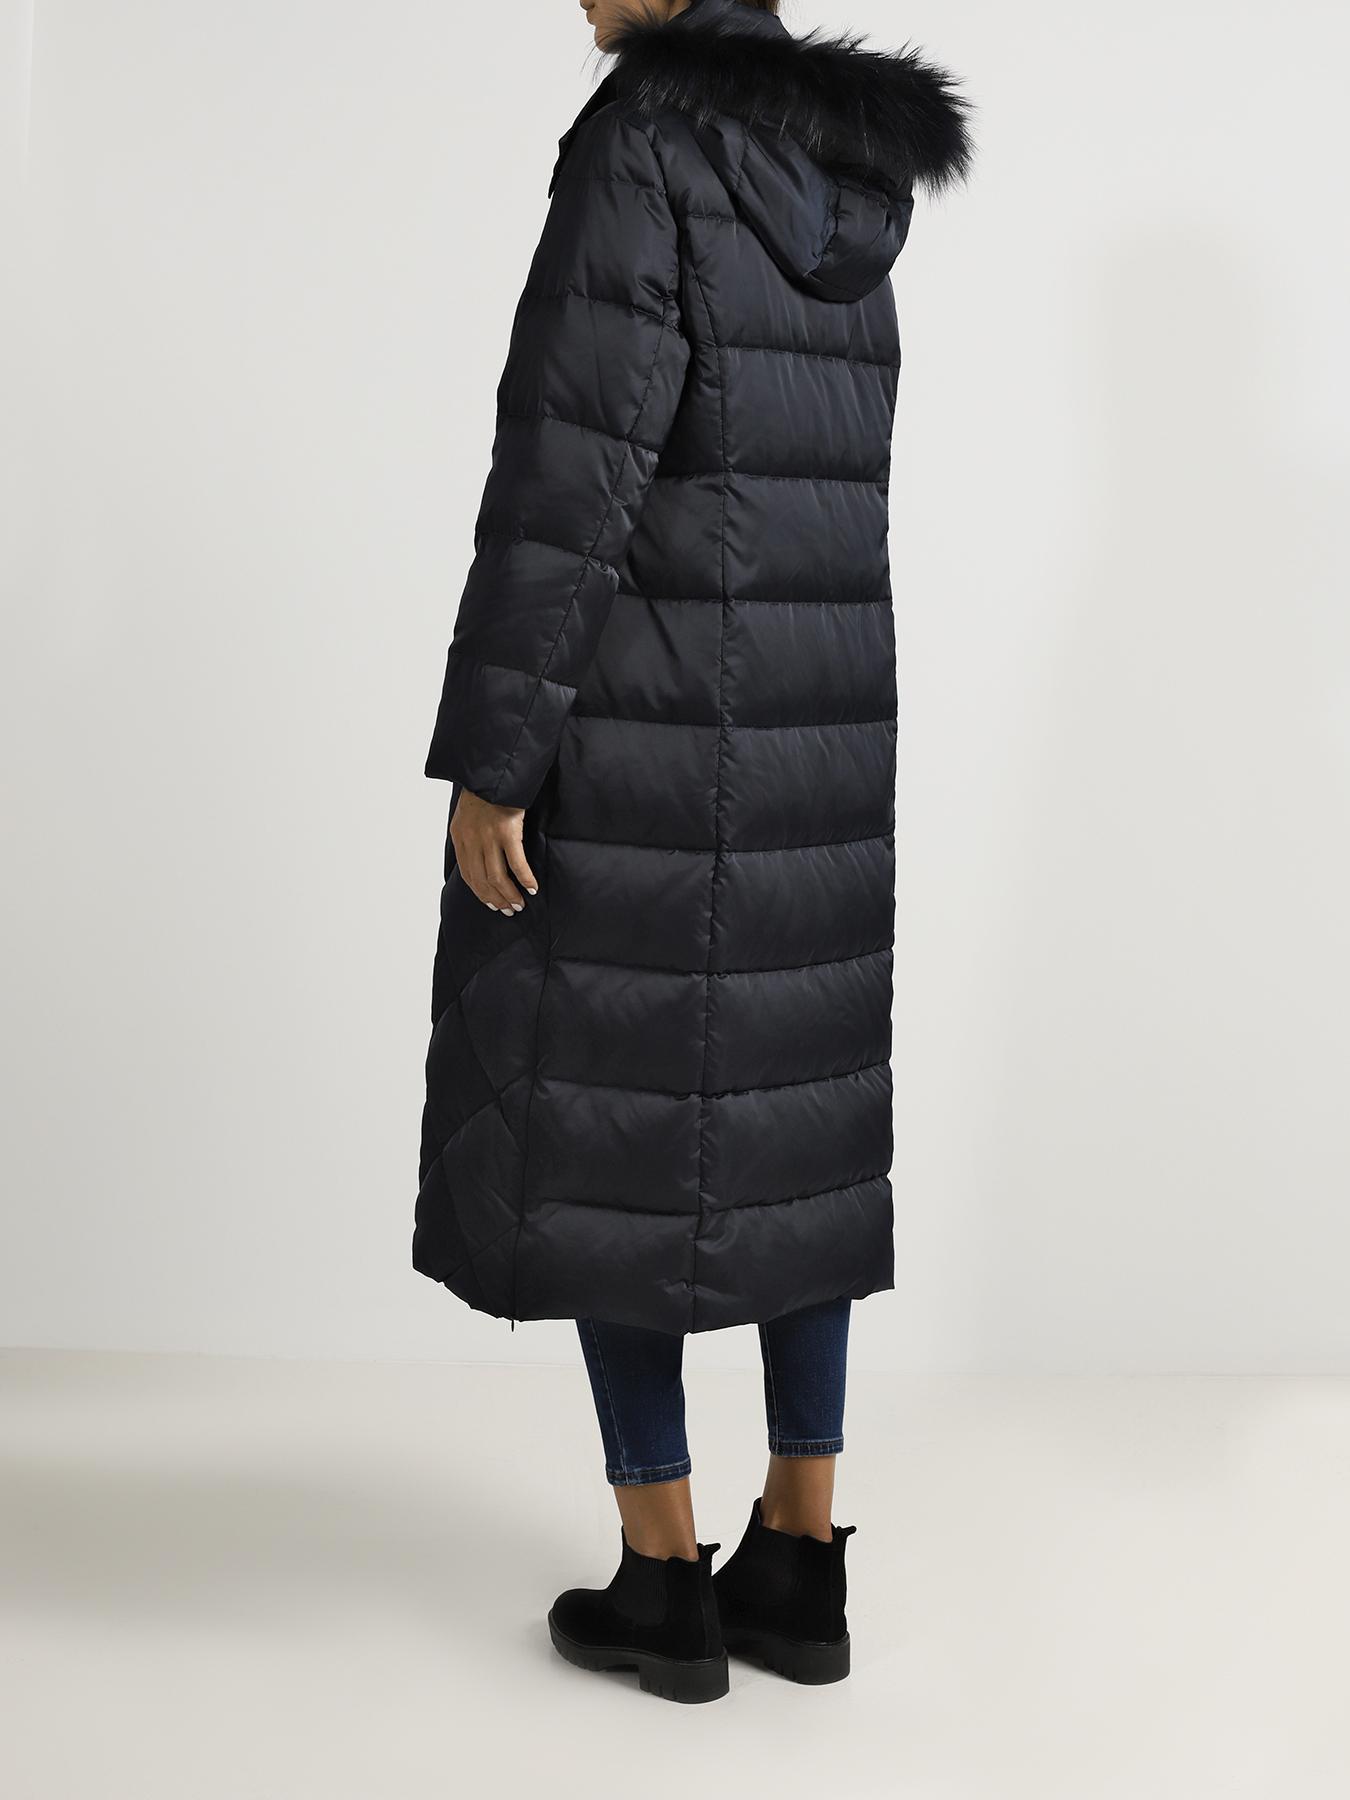 Persona by Marina Rinaldi Удлиненная куртка plus size 353773-056 Фото 2